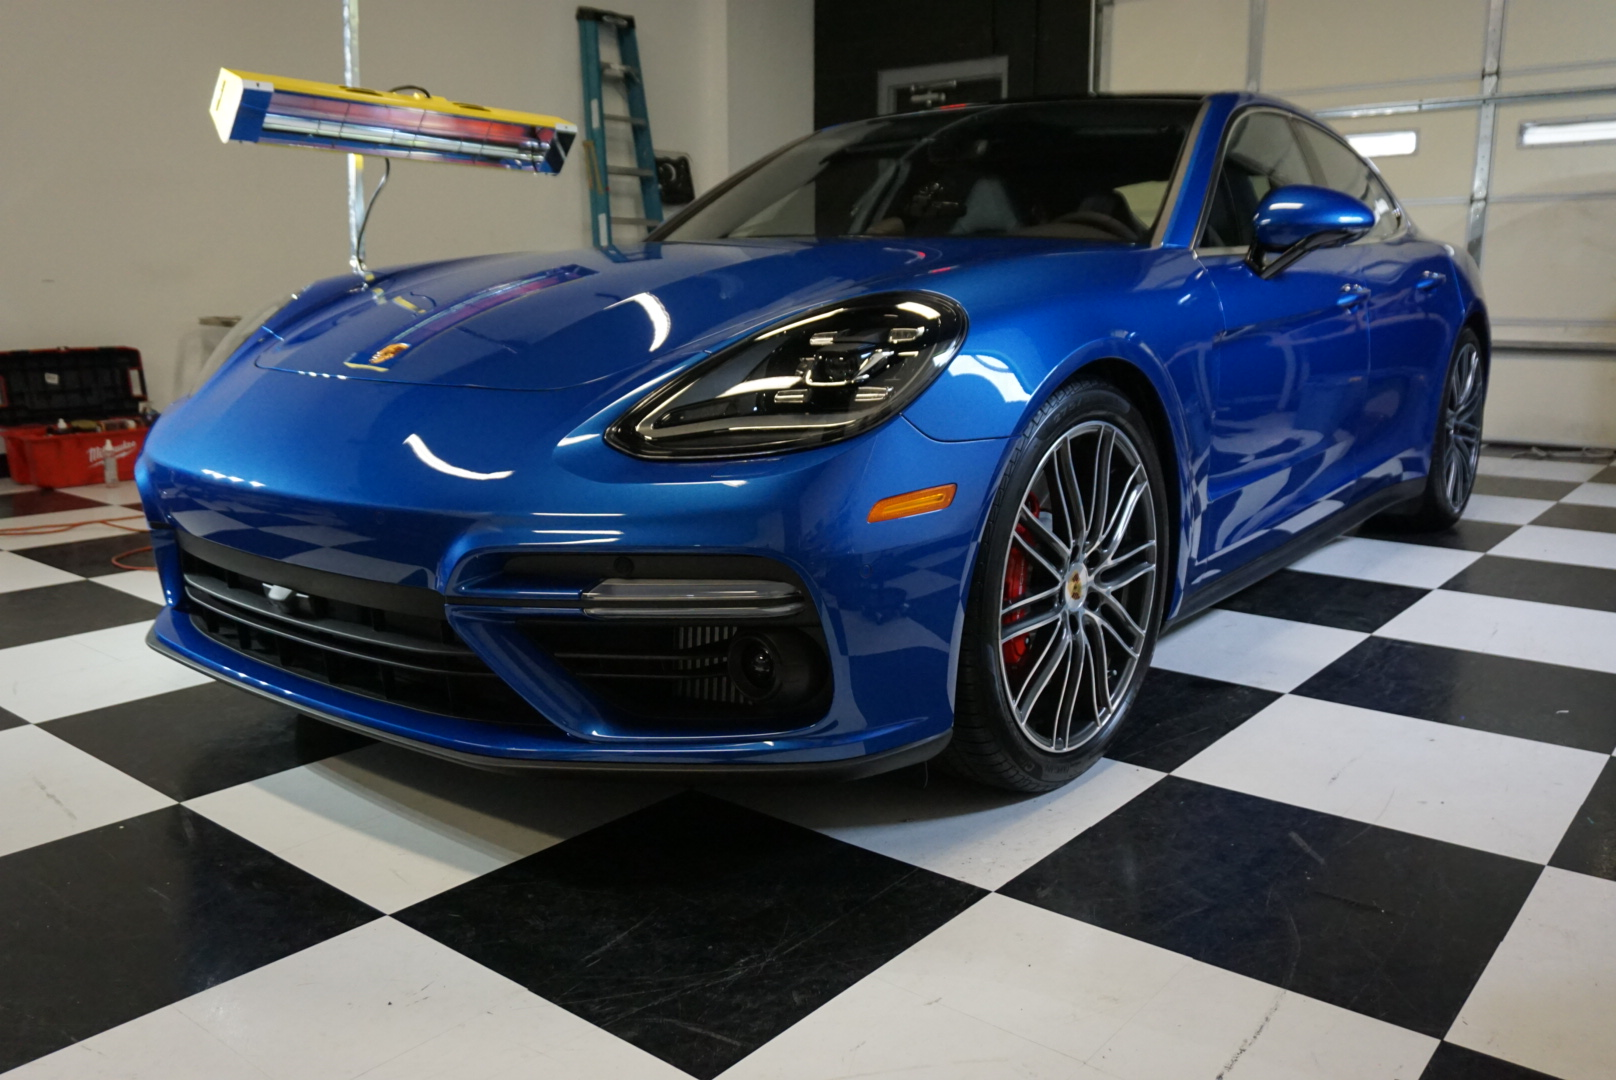 Photos of finished 2017 Porsche Panamara